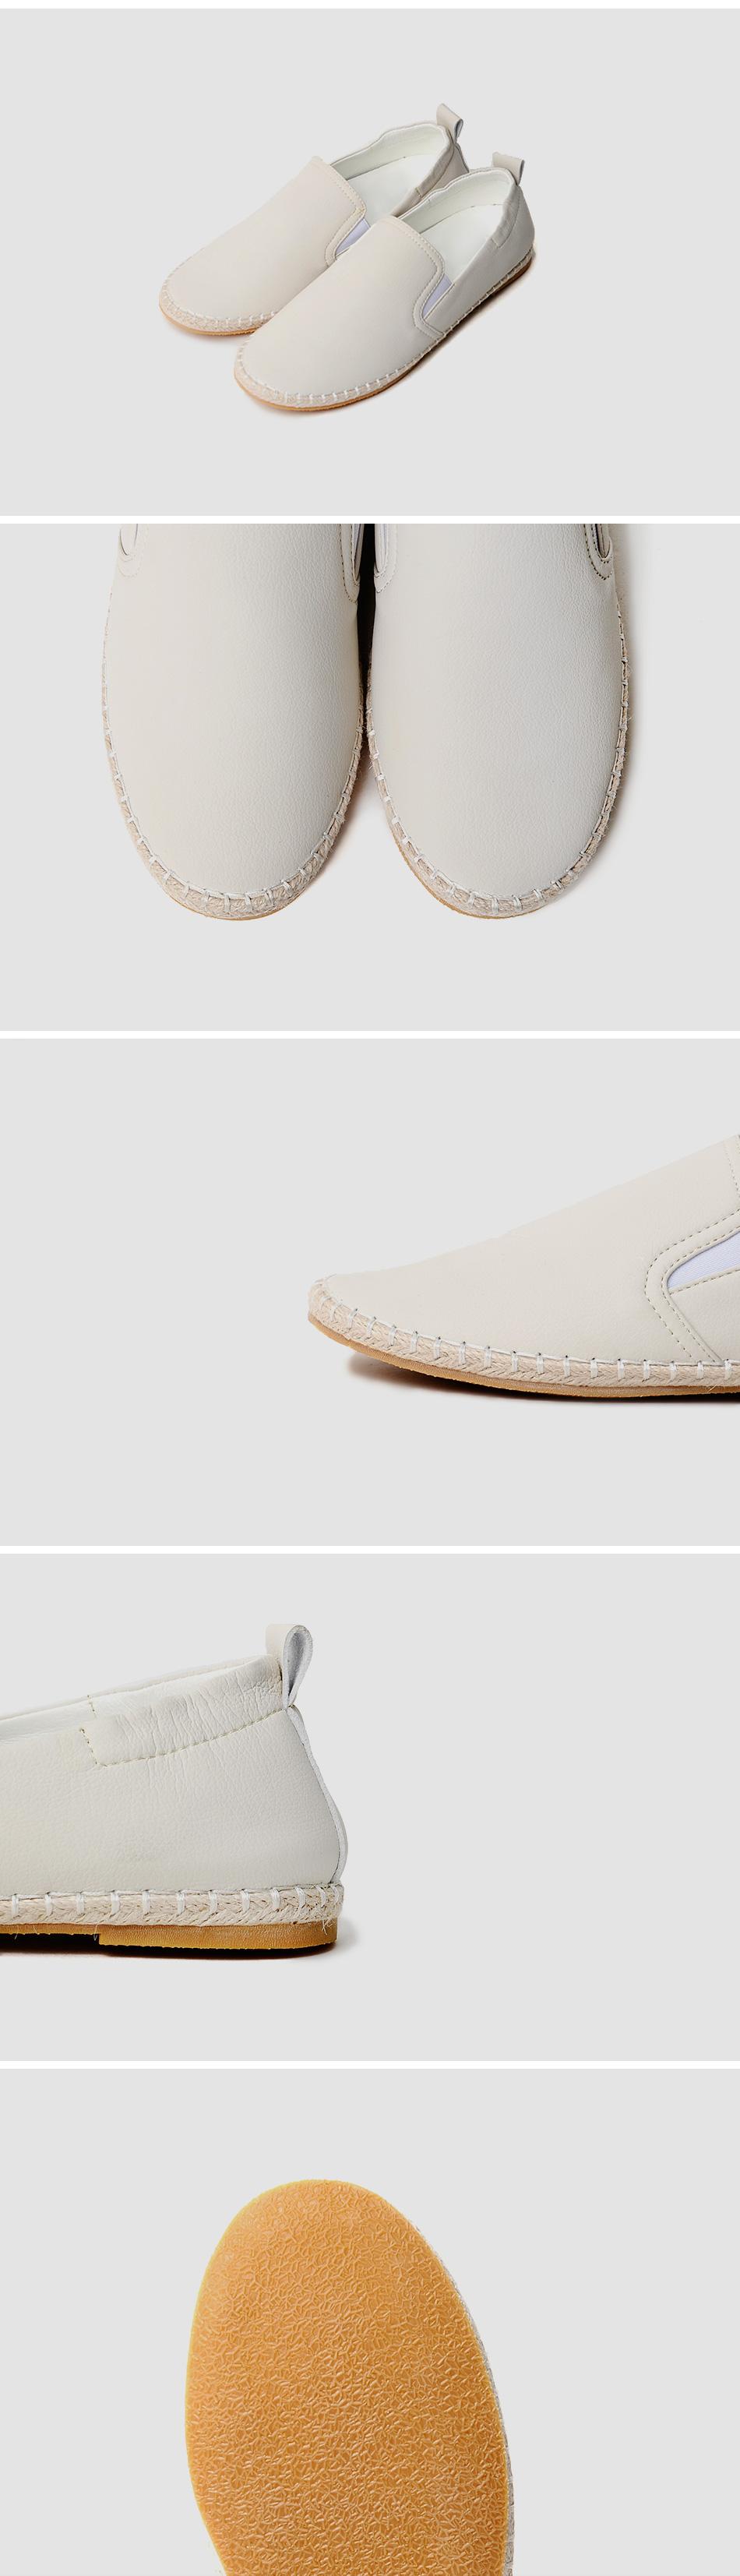 Levion Slip-on Leather 1cm